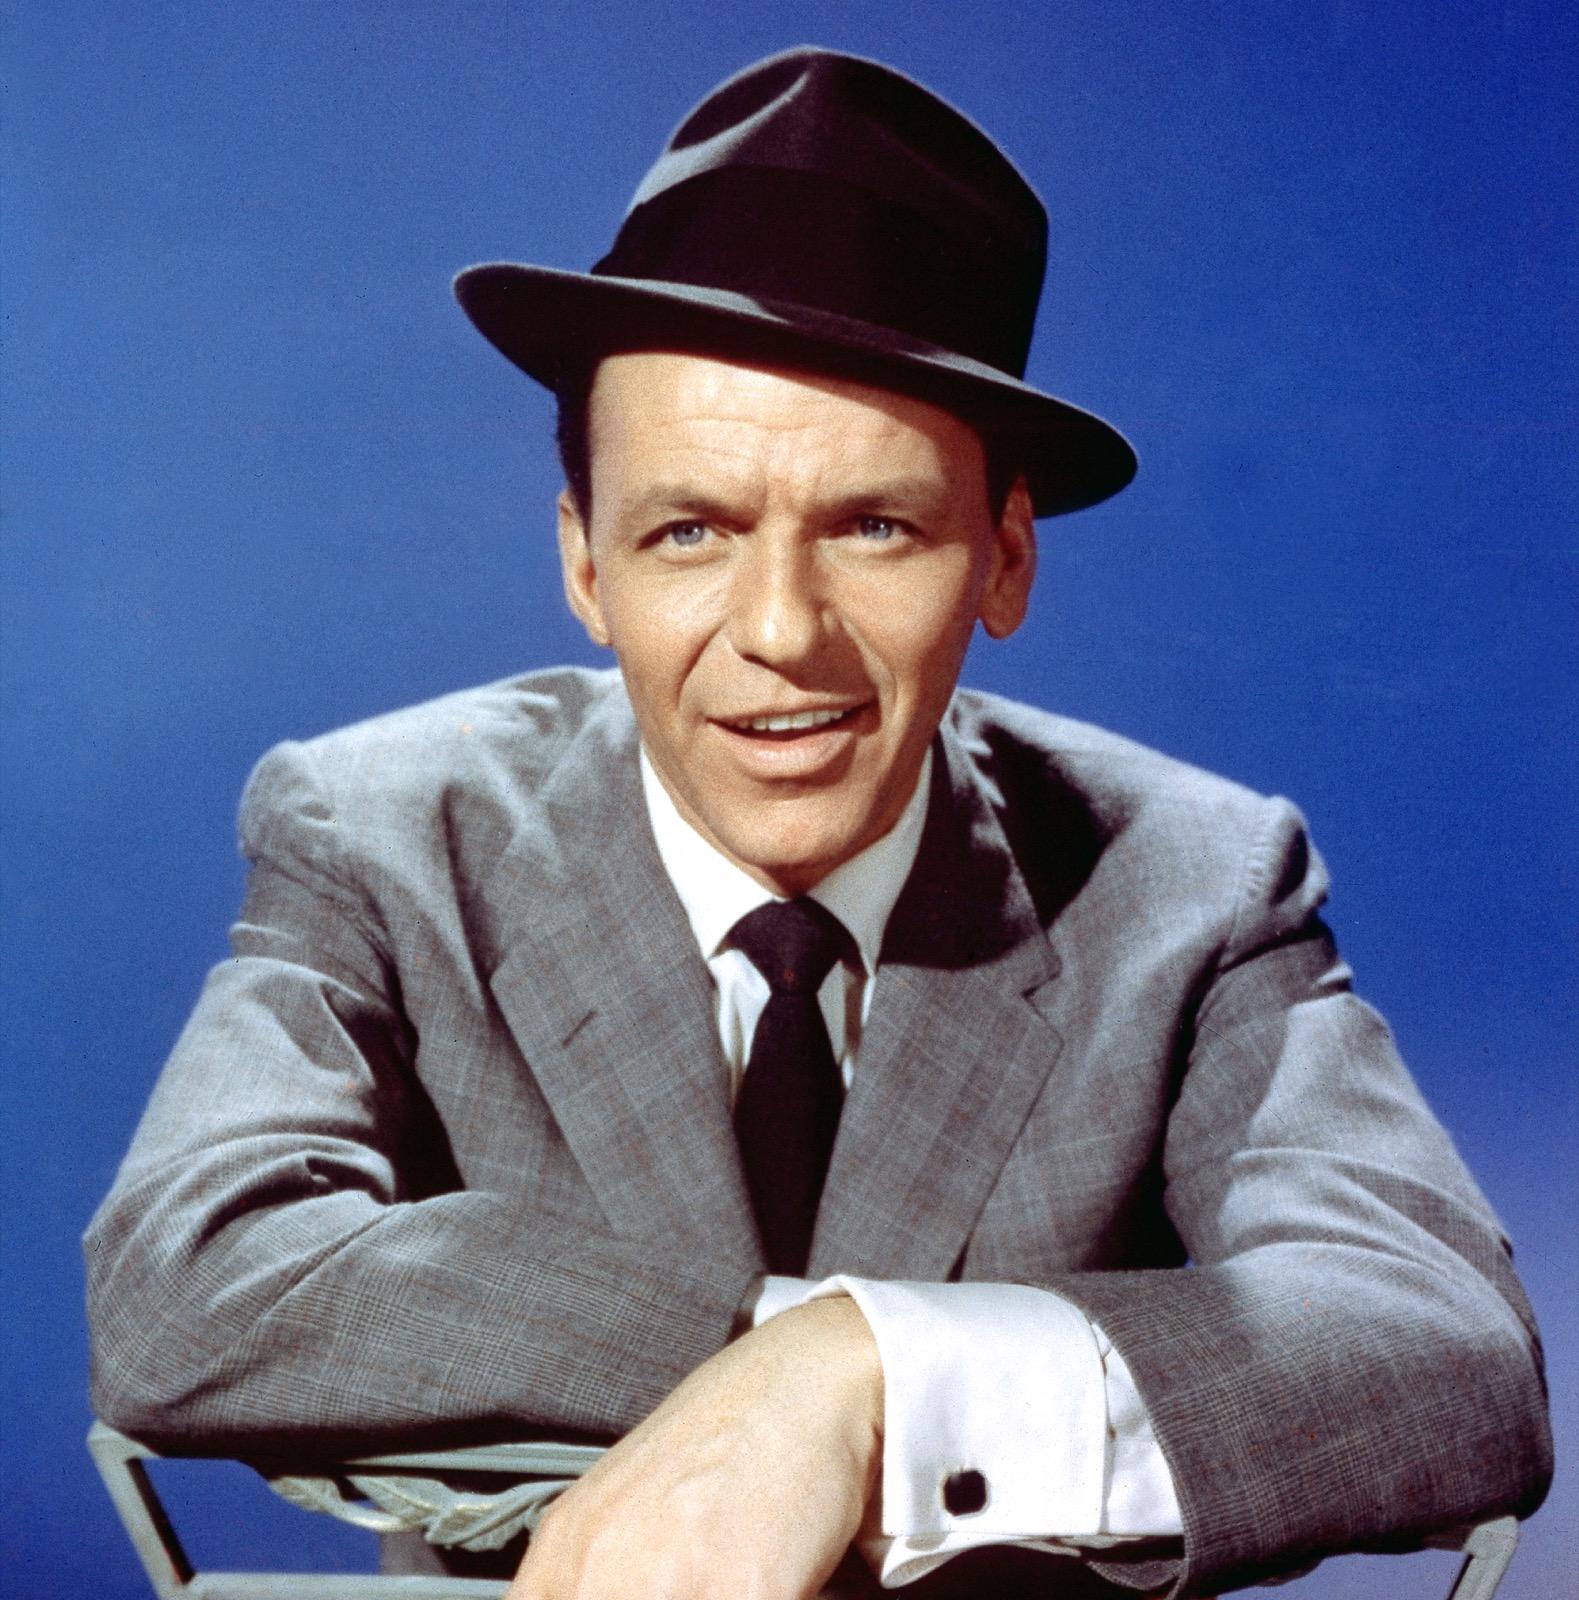 Celebrating Frank Sinatra's 100th Birthday: Pictures